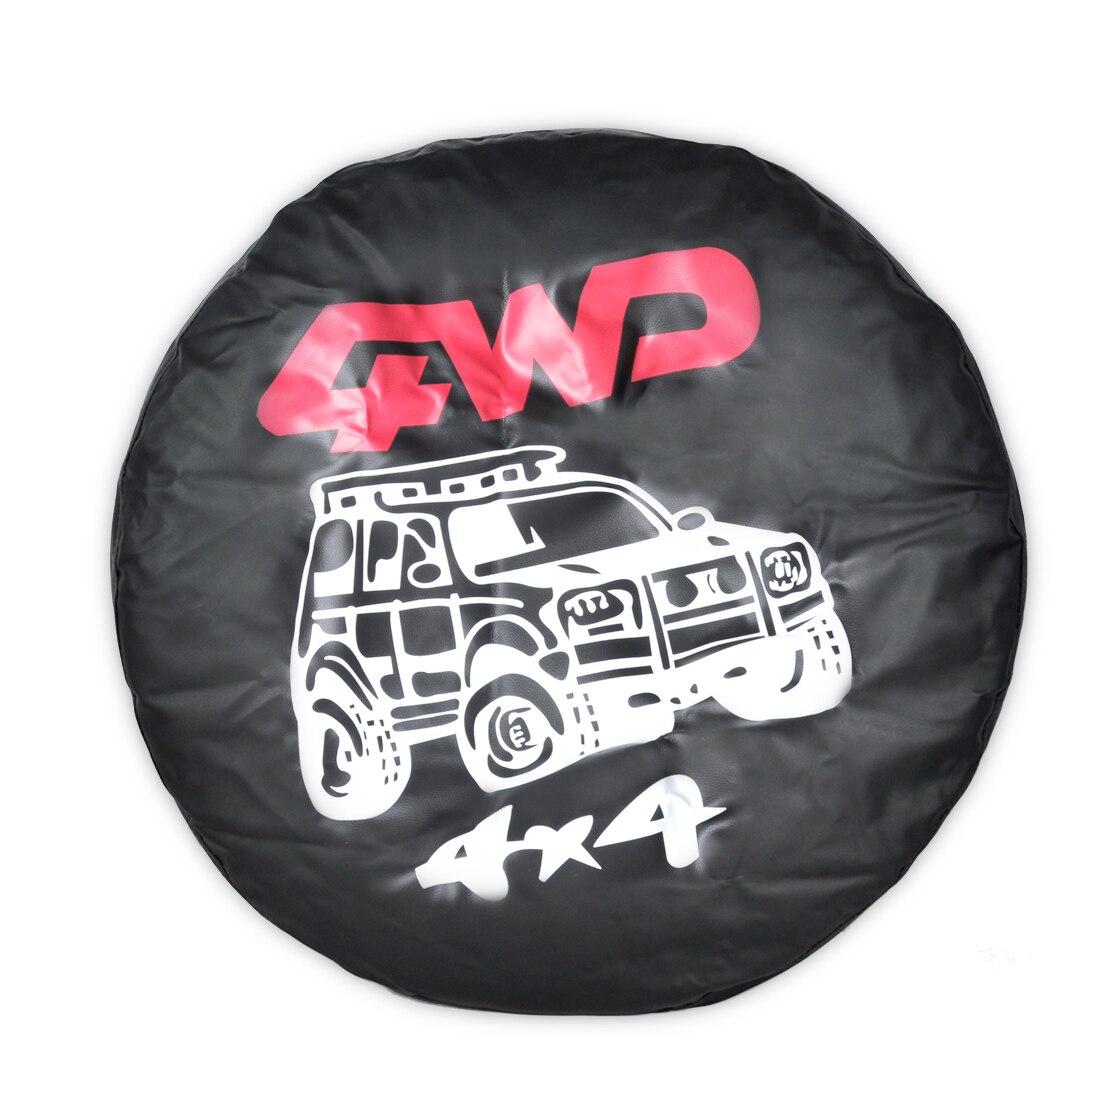 CITALL автомобиля CY-64 27 Размеры S 4WD Спорт запасное колесо шин Мягкая обложка для hyundai Kia VW Golf nissan Chevrolet BMW Renault